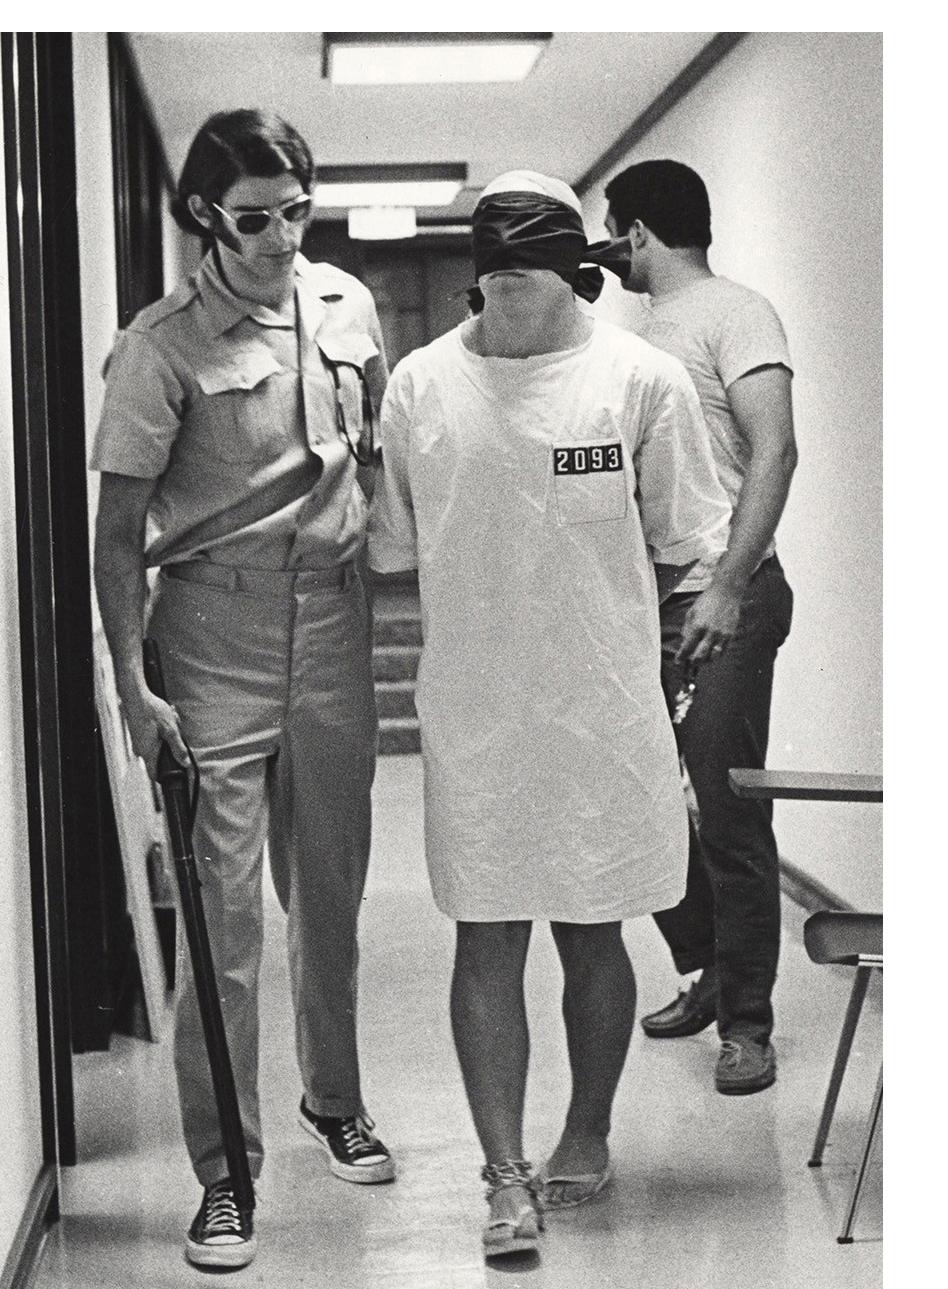 Bild från Stanfordexperimentet 1971